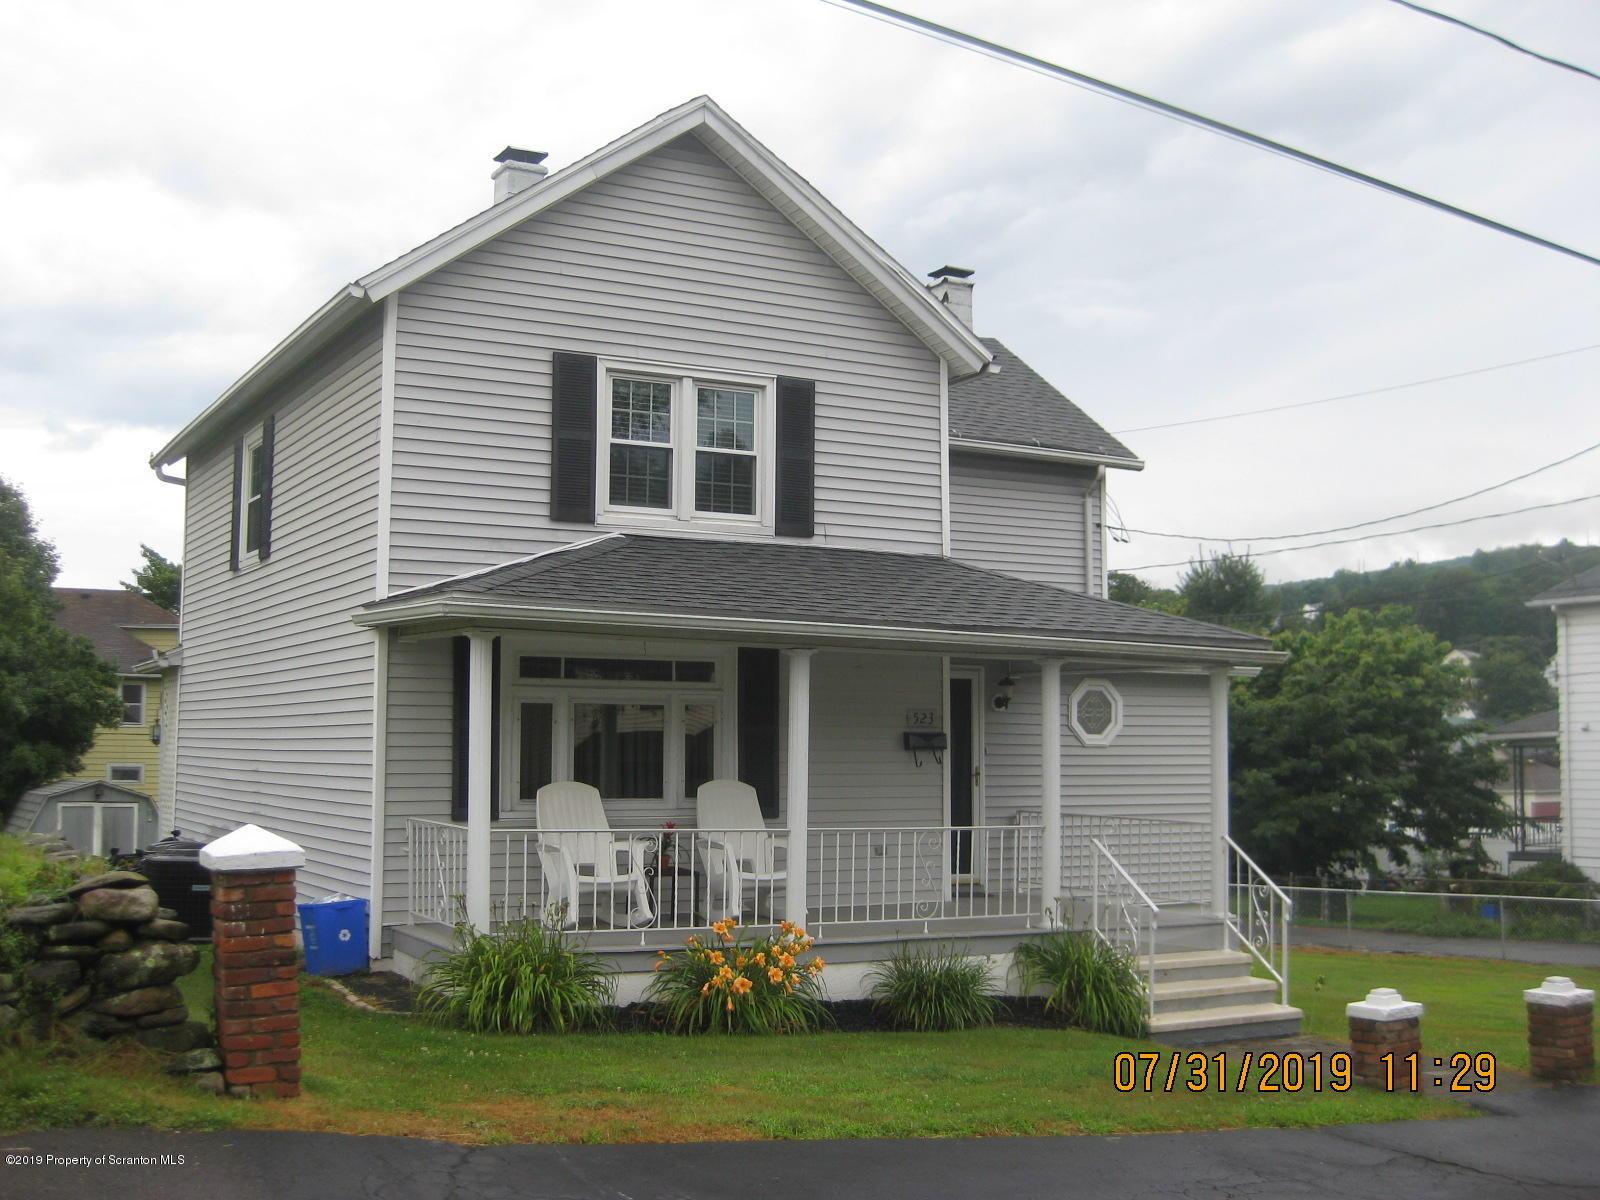 523 Pancoast St, Dickson City, Pennsylvania 18519, 3 Bedrooms Bedrooms, 6 Rooms Rooms,2 BathroomsBathrooms,Single Family,For Sale,Pancoast,19-3686